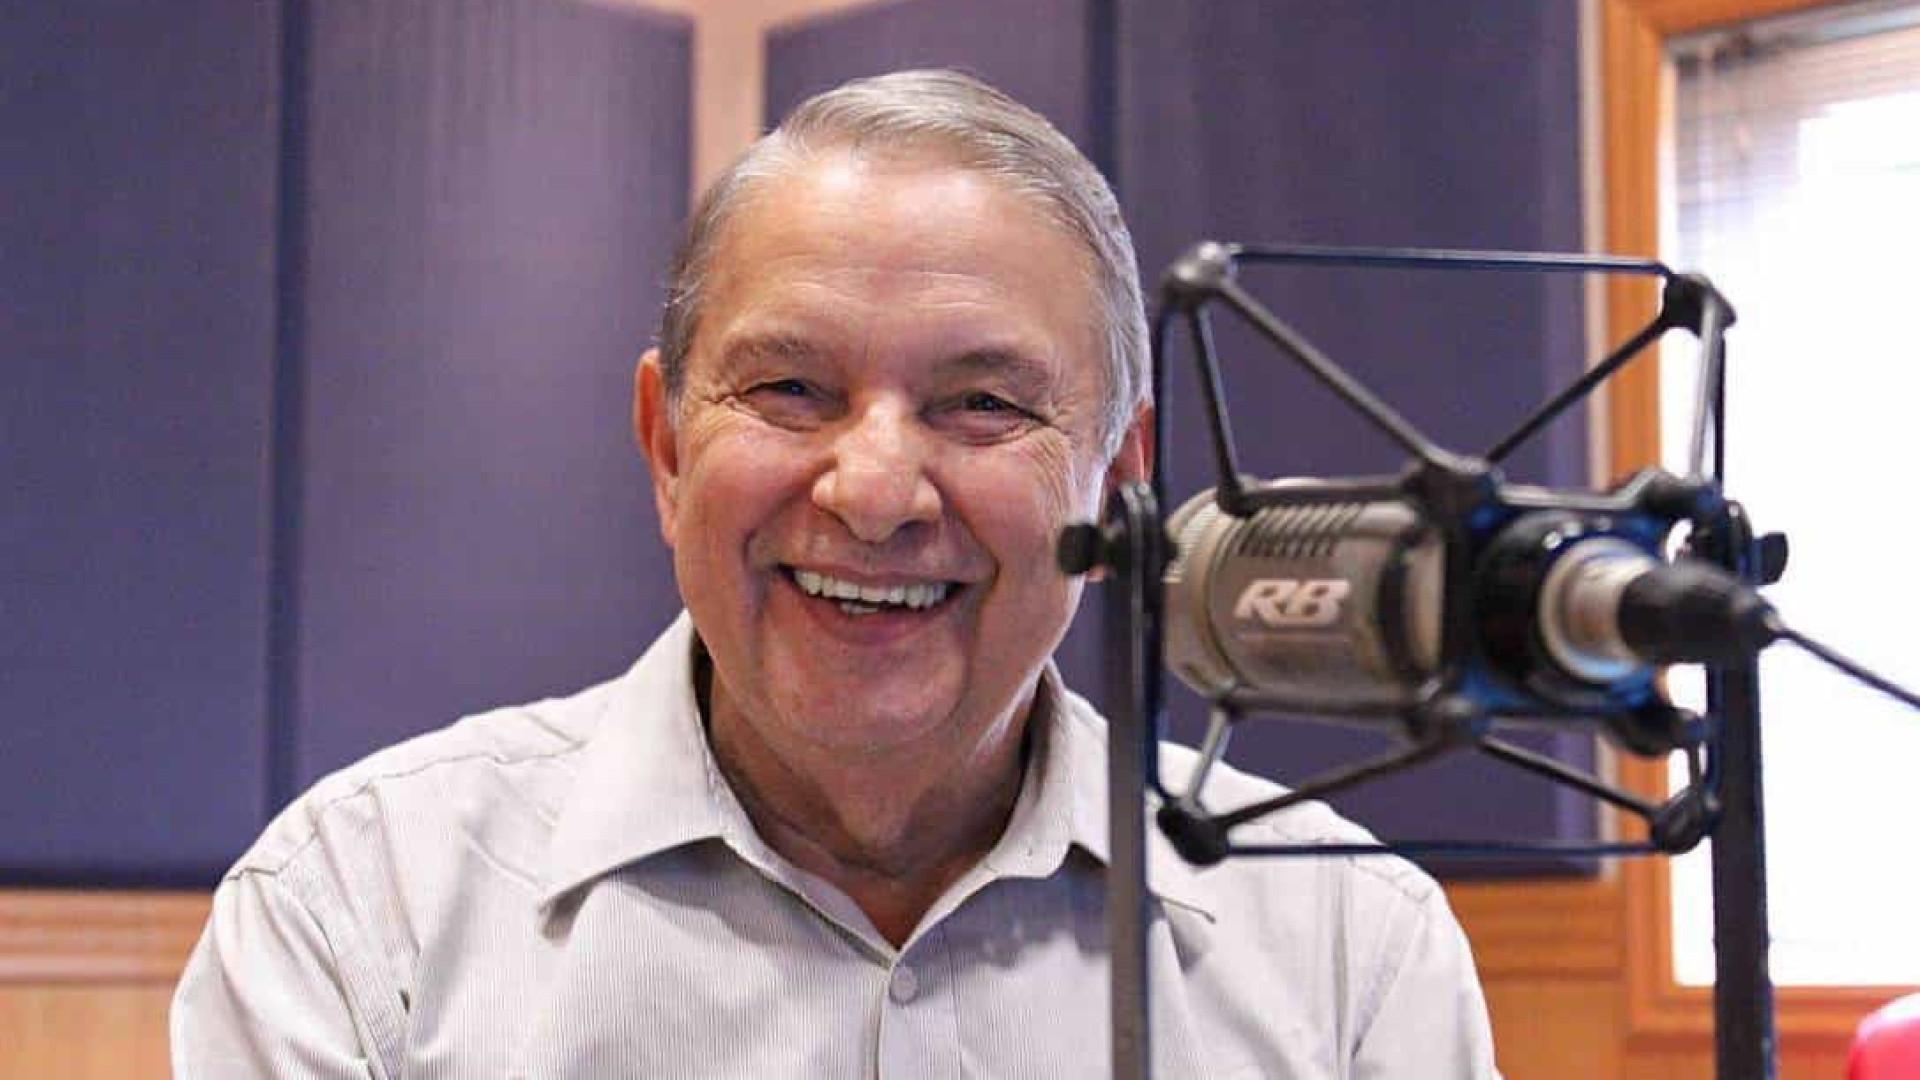 Jornalista e radialista José Paulo de Andrade morre com covid-19